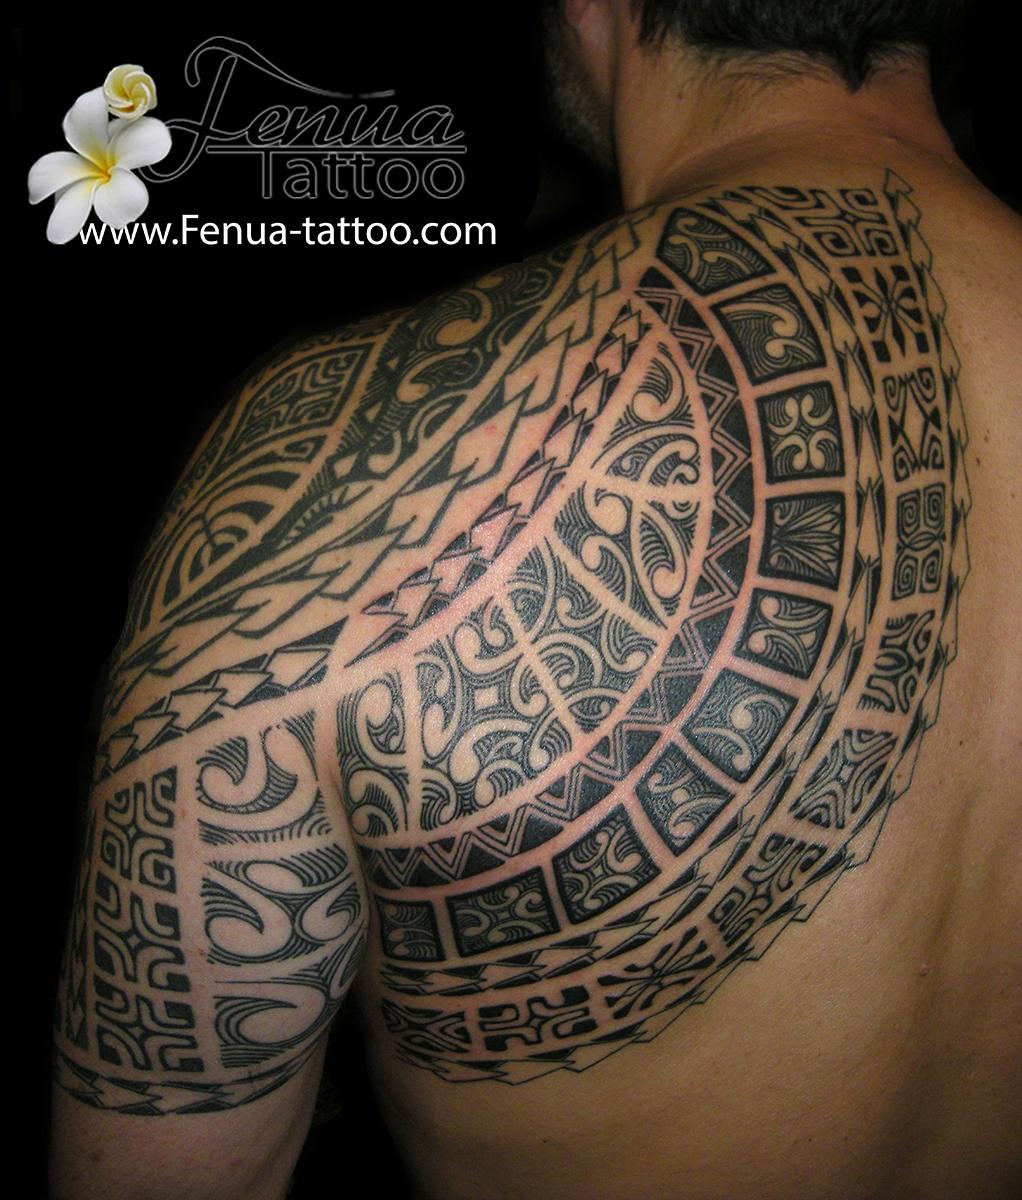 photos de tatouage polyn sien tattoo polynesien. Black Bedroom Furniture Sets. Home Design Ideas